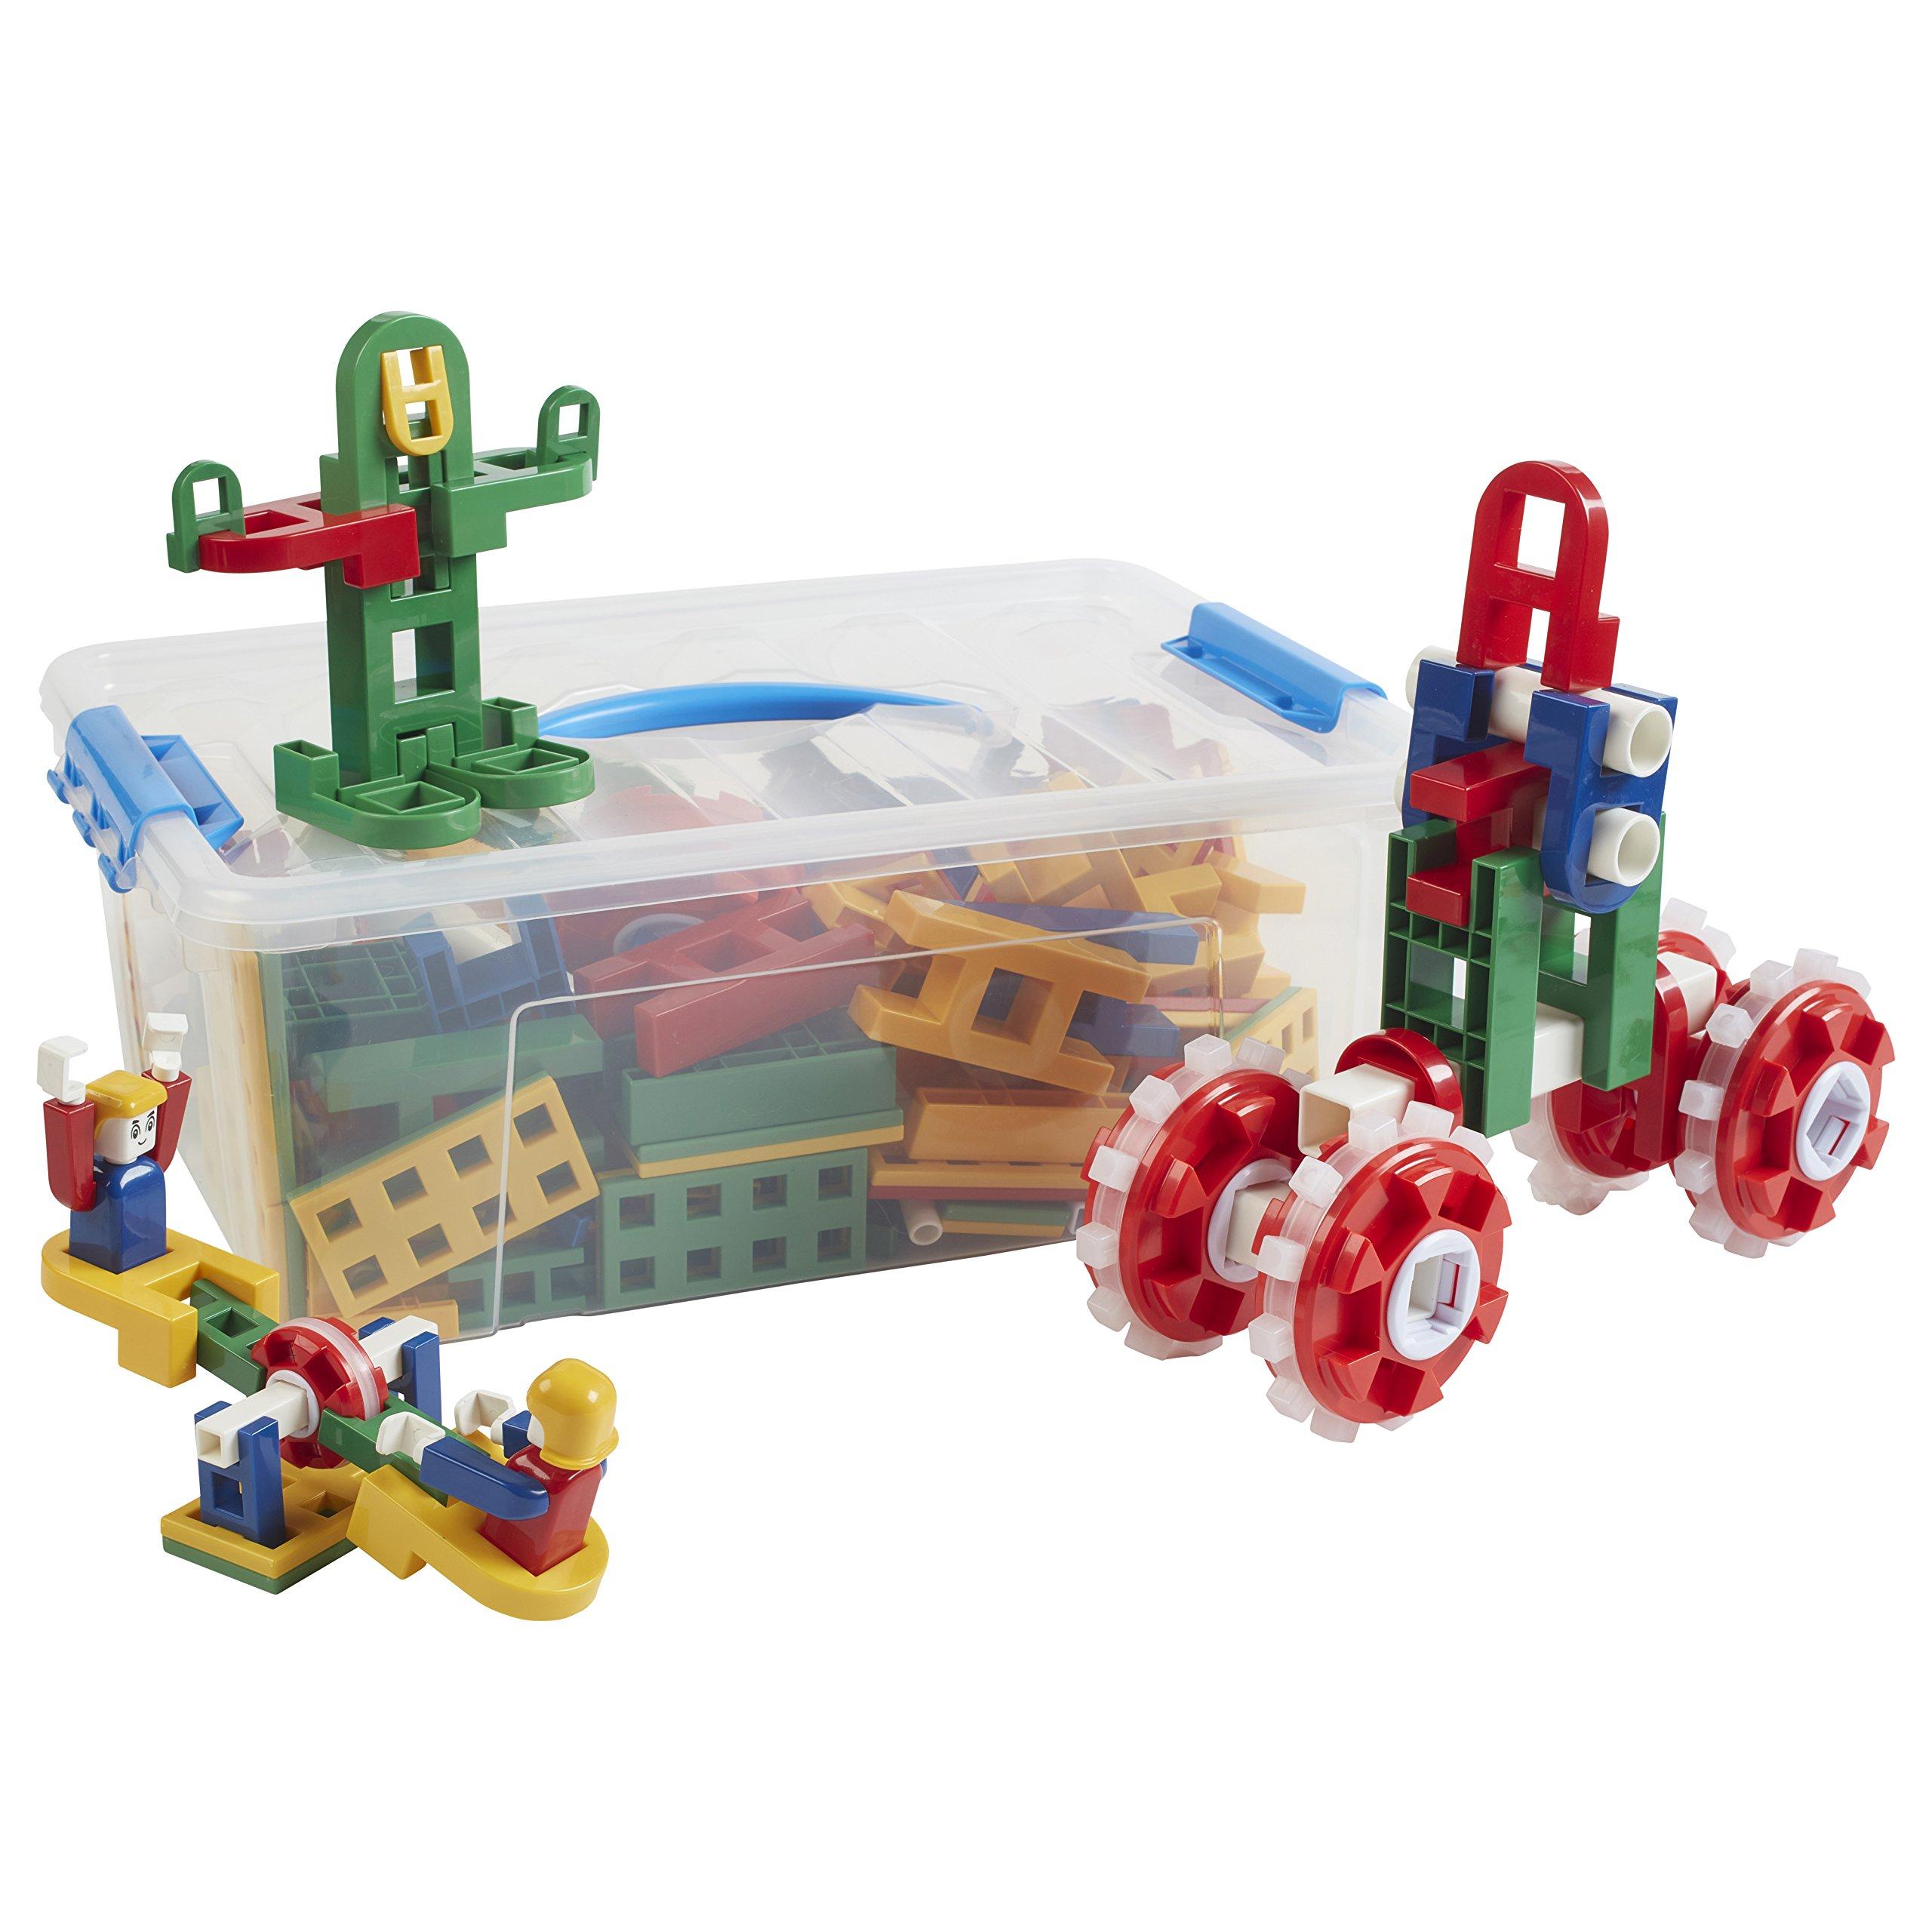 ECR4Kids Lil Engineer's Construction Kit Math Manipulatives Building Kit, Educational Sensory Learning Toys for Children (290-Piece Set)